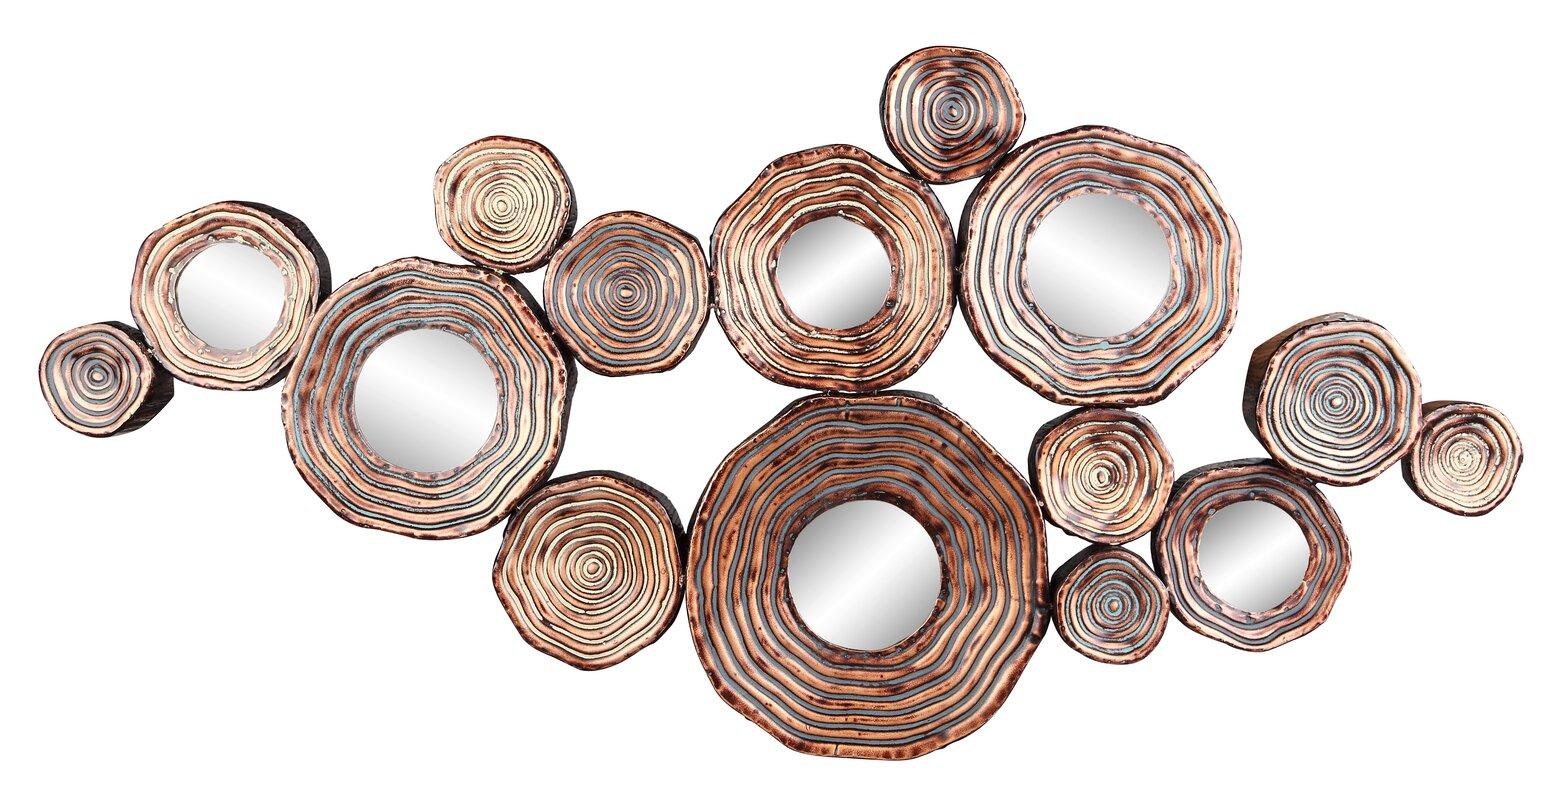 Circle Metal and Mirror Cluster Wall Decor & Reviews | AllModern